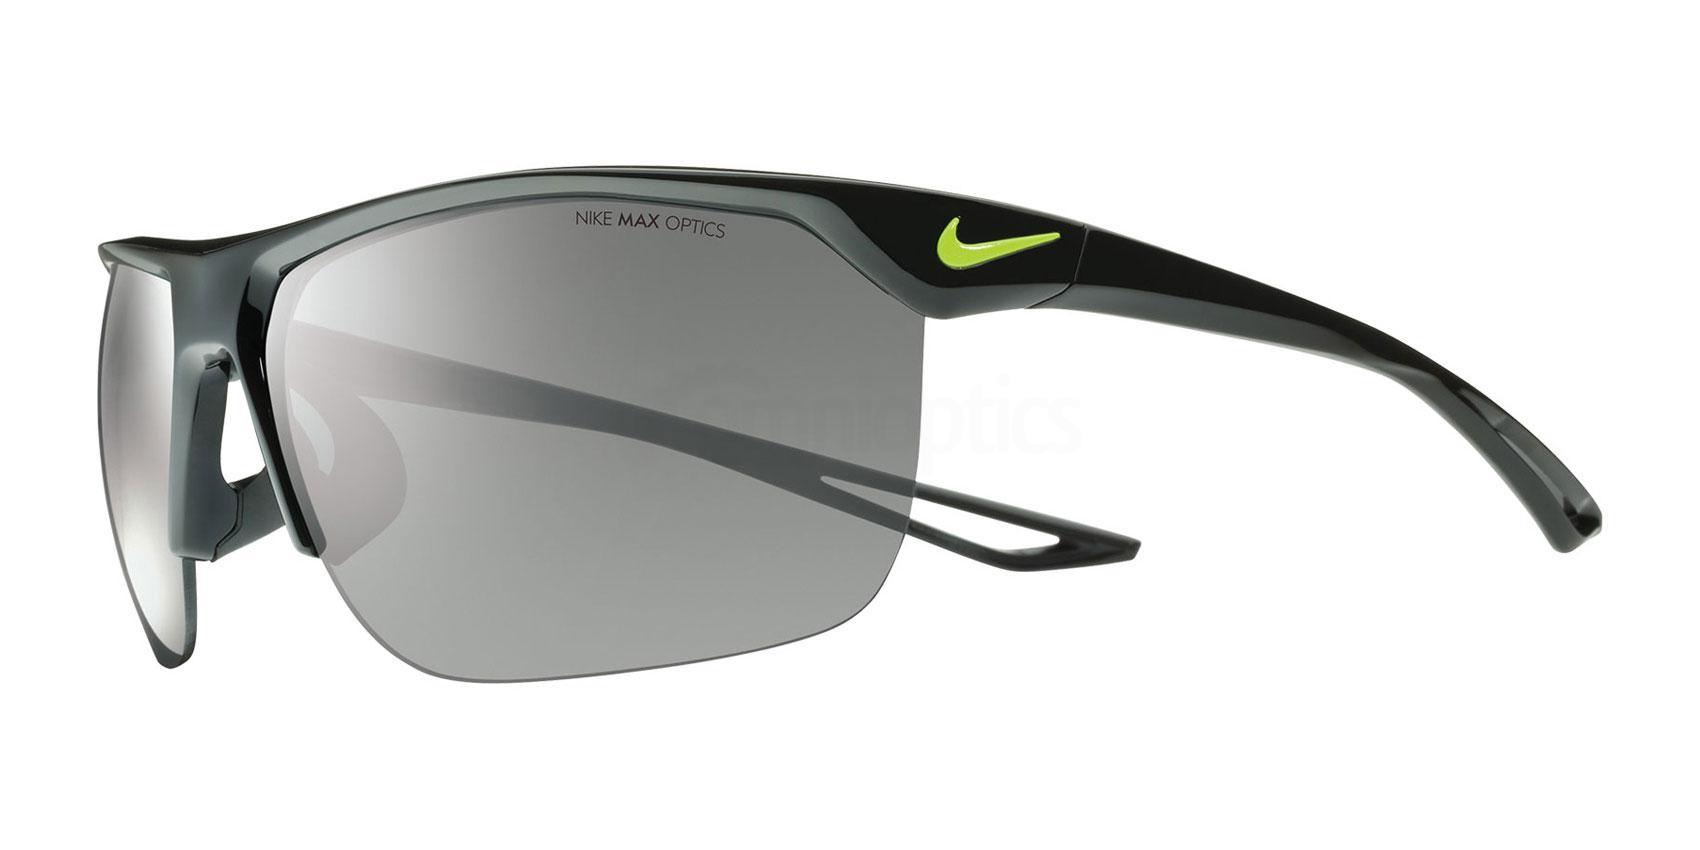 001 TRAINER EV0934 Sunglasses, Nike